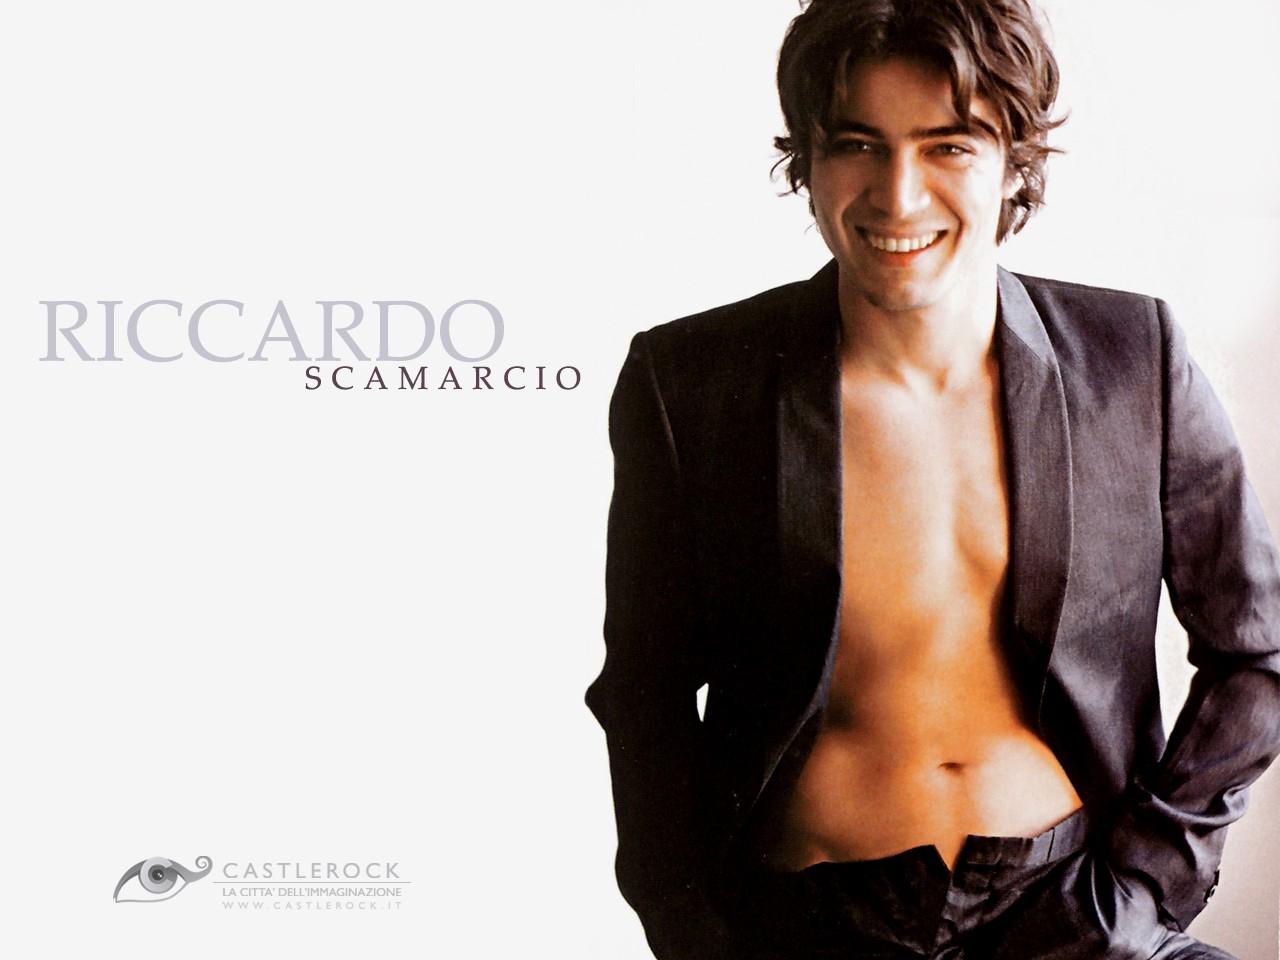 Wallpaper di Riccardo Scamarcio a torso nudo